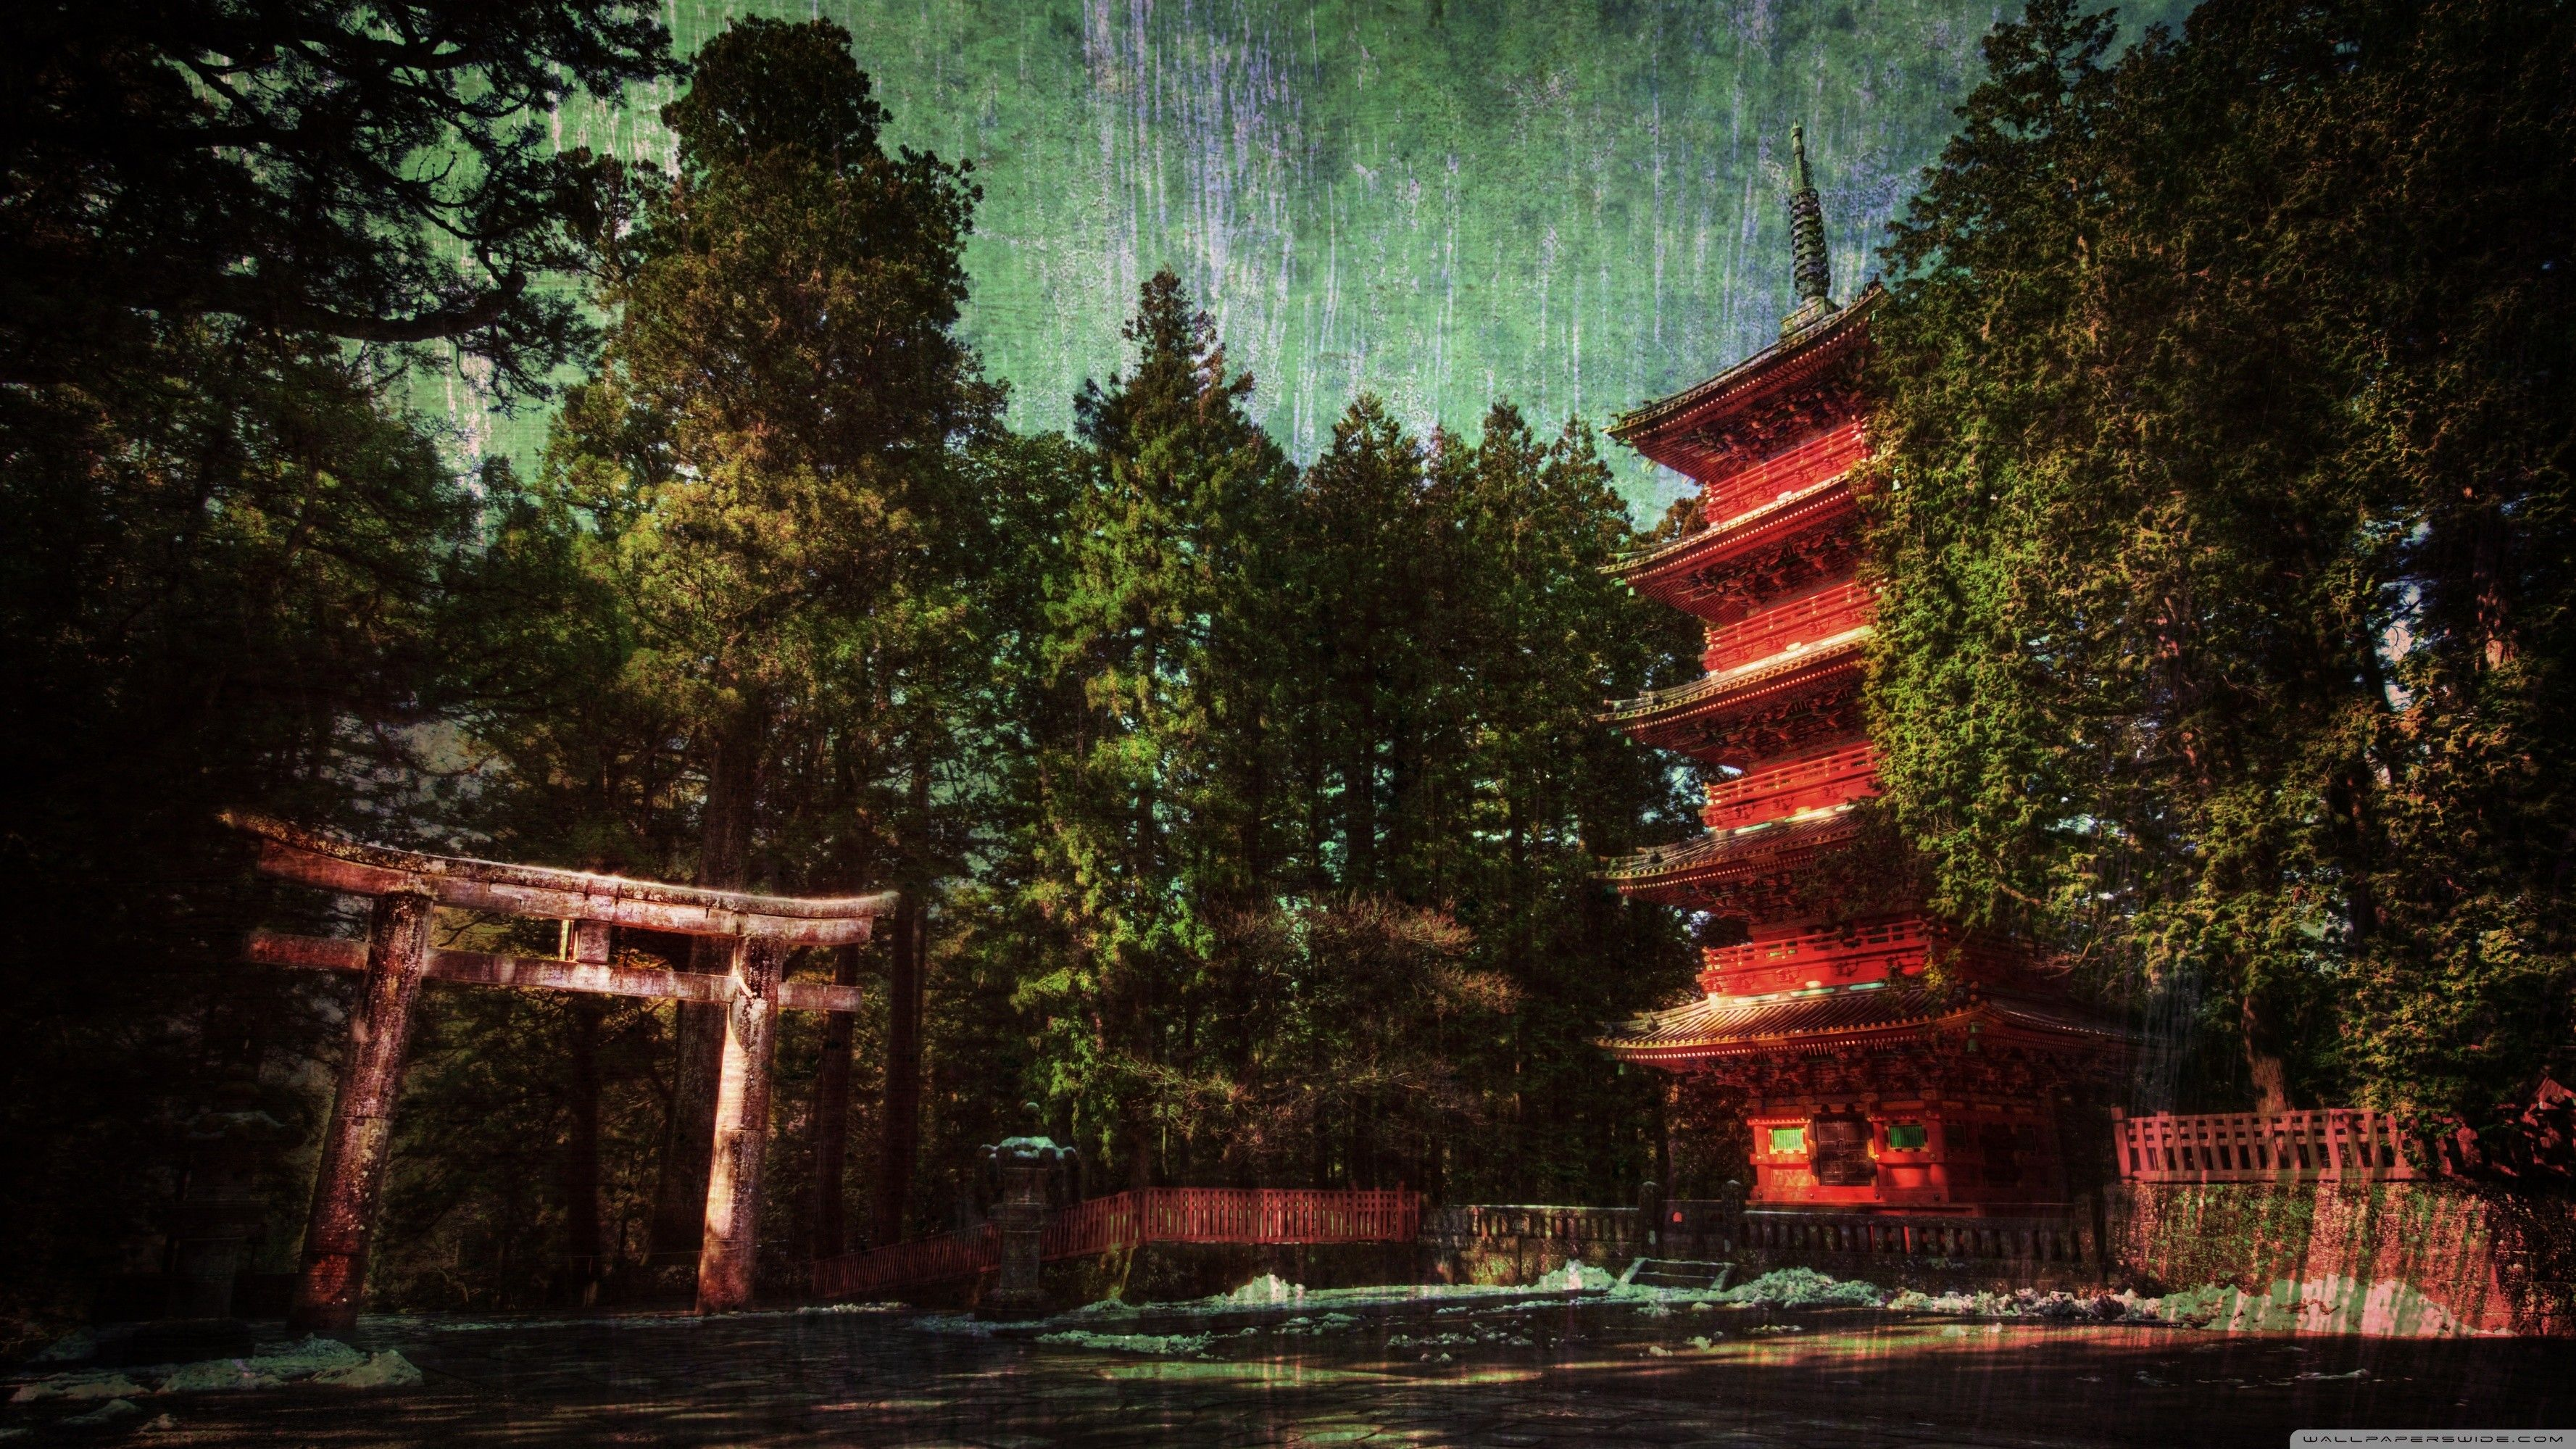 Uhd Japan Wallpapers Top Free Uhd Japan Backgrounds Wallpaperaccess